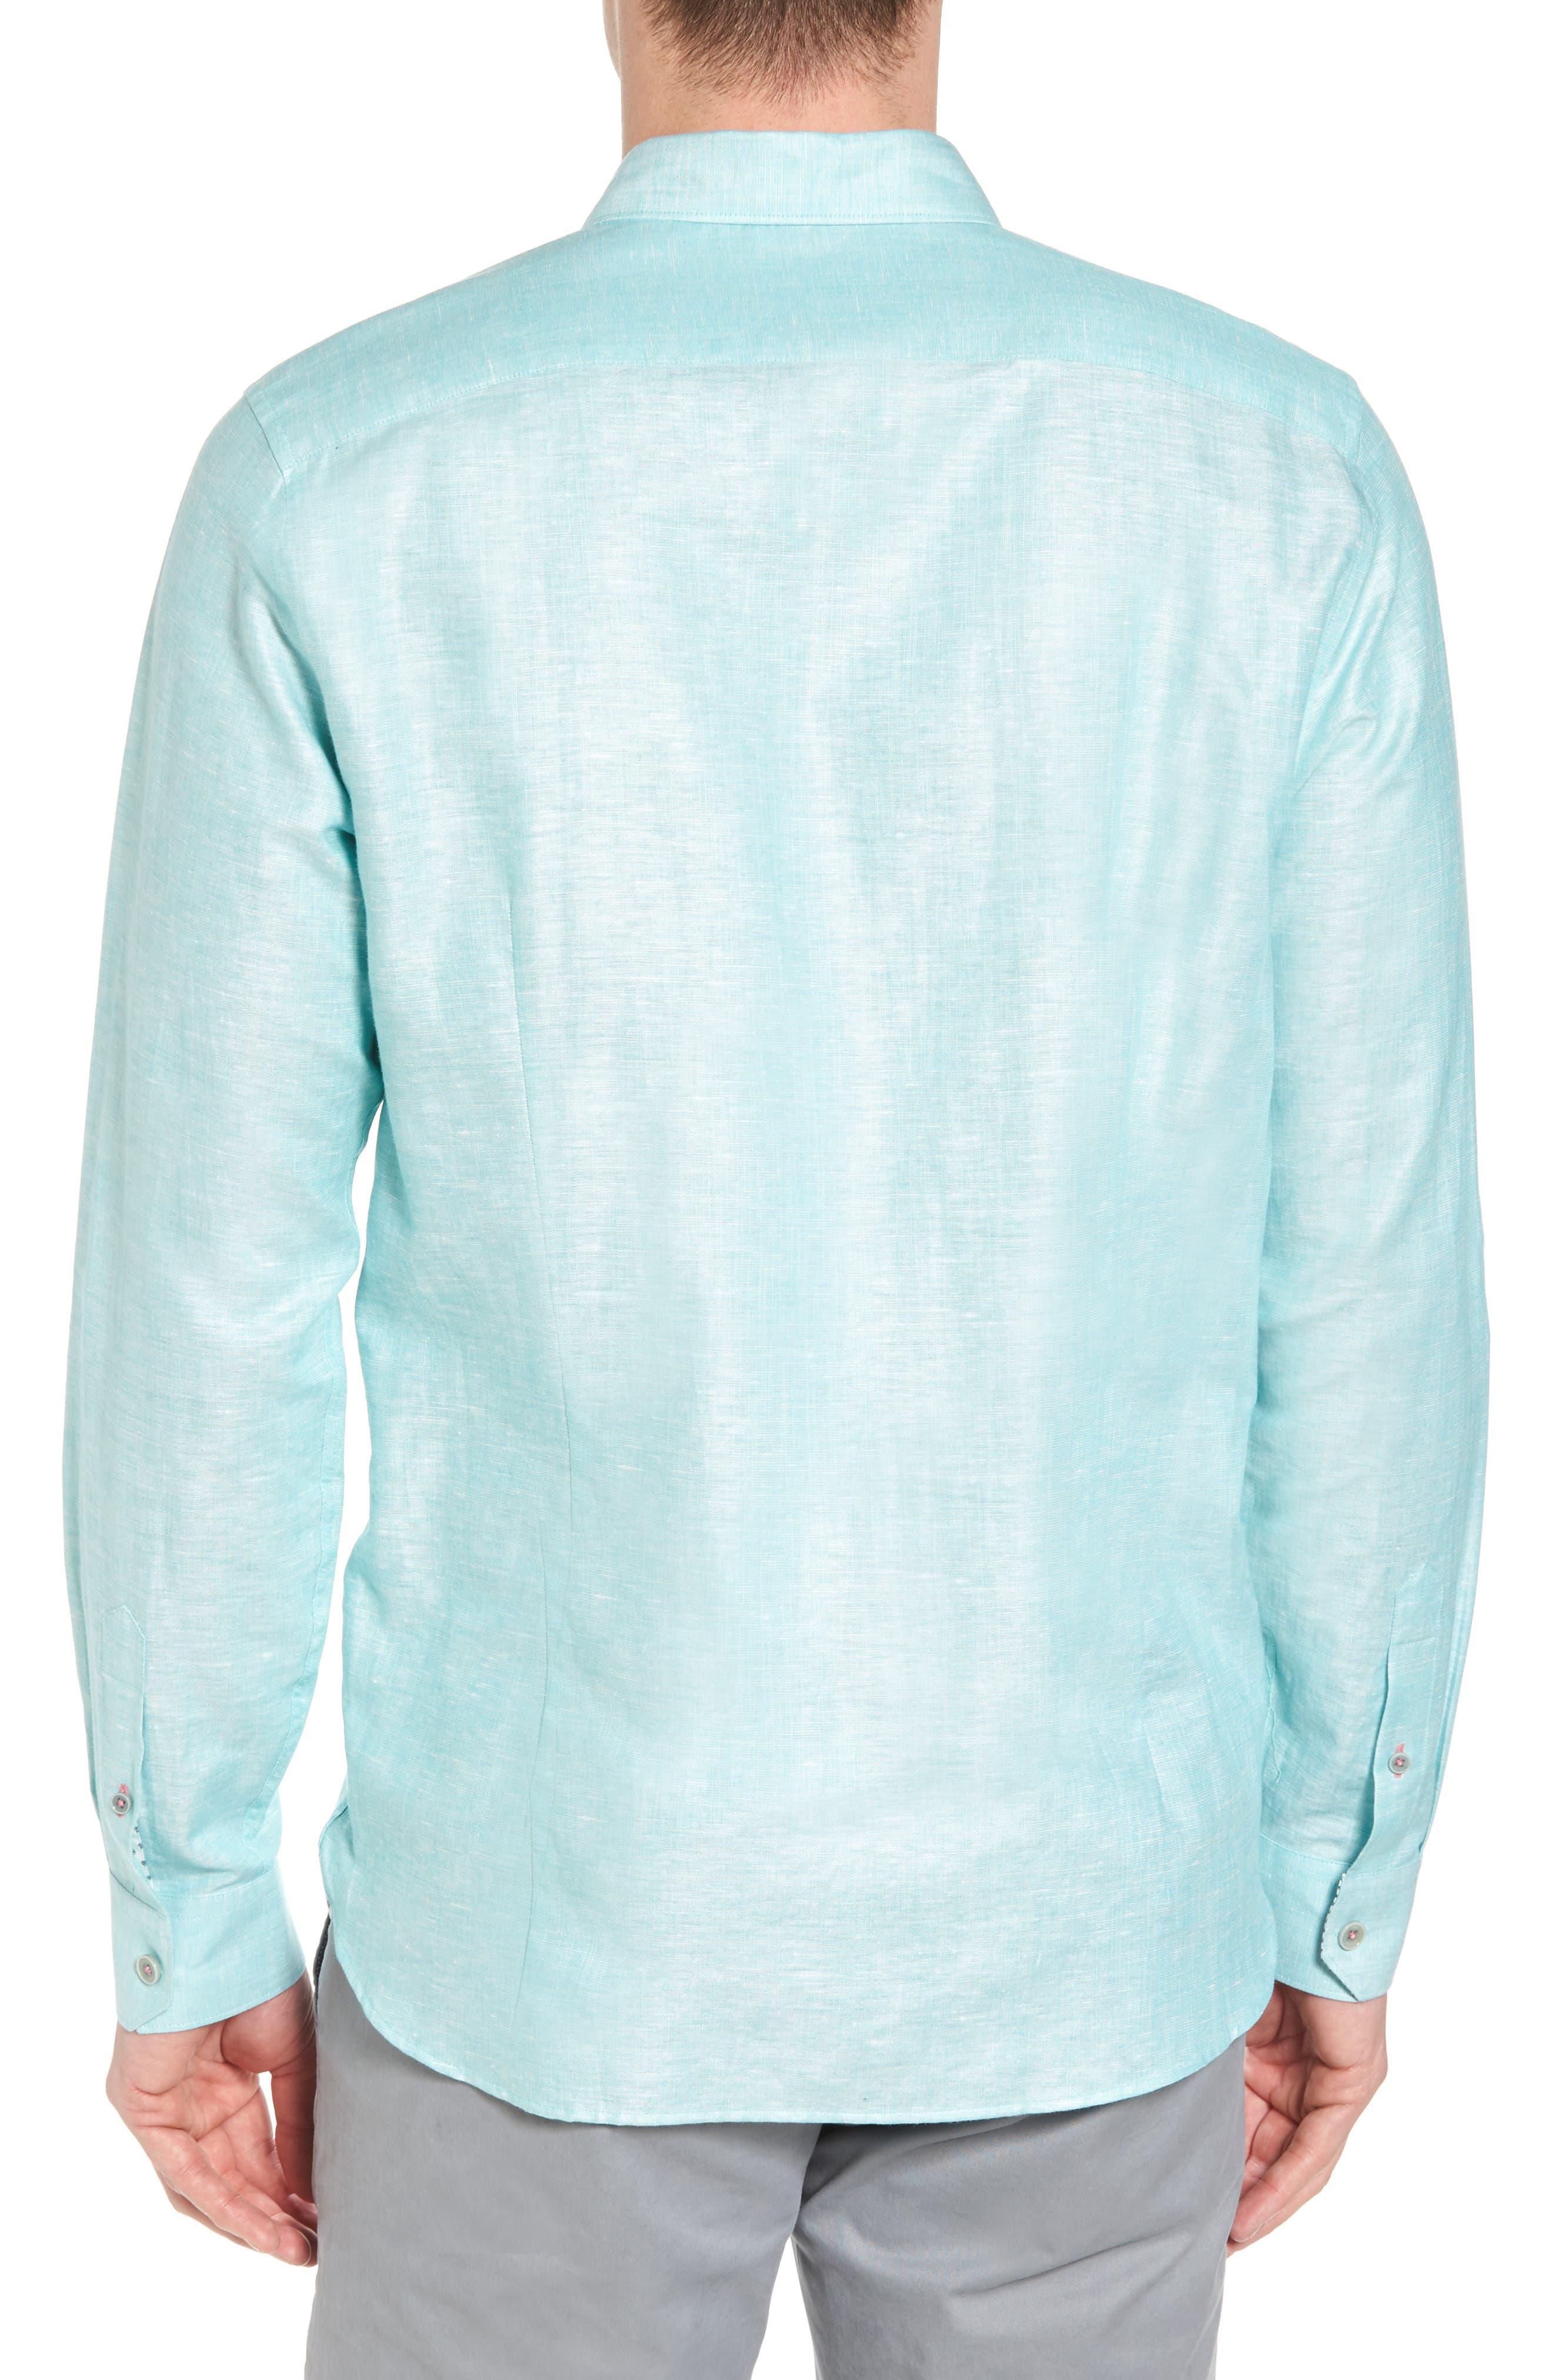 Linlins Herringbone Cotton & Linen Sport Shirt,                             Alternate thumbnail 7, color,